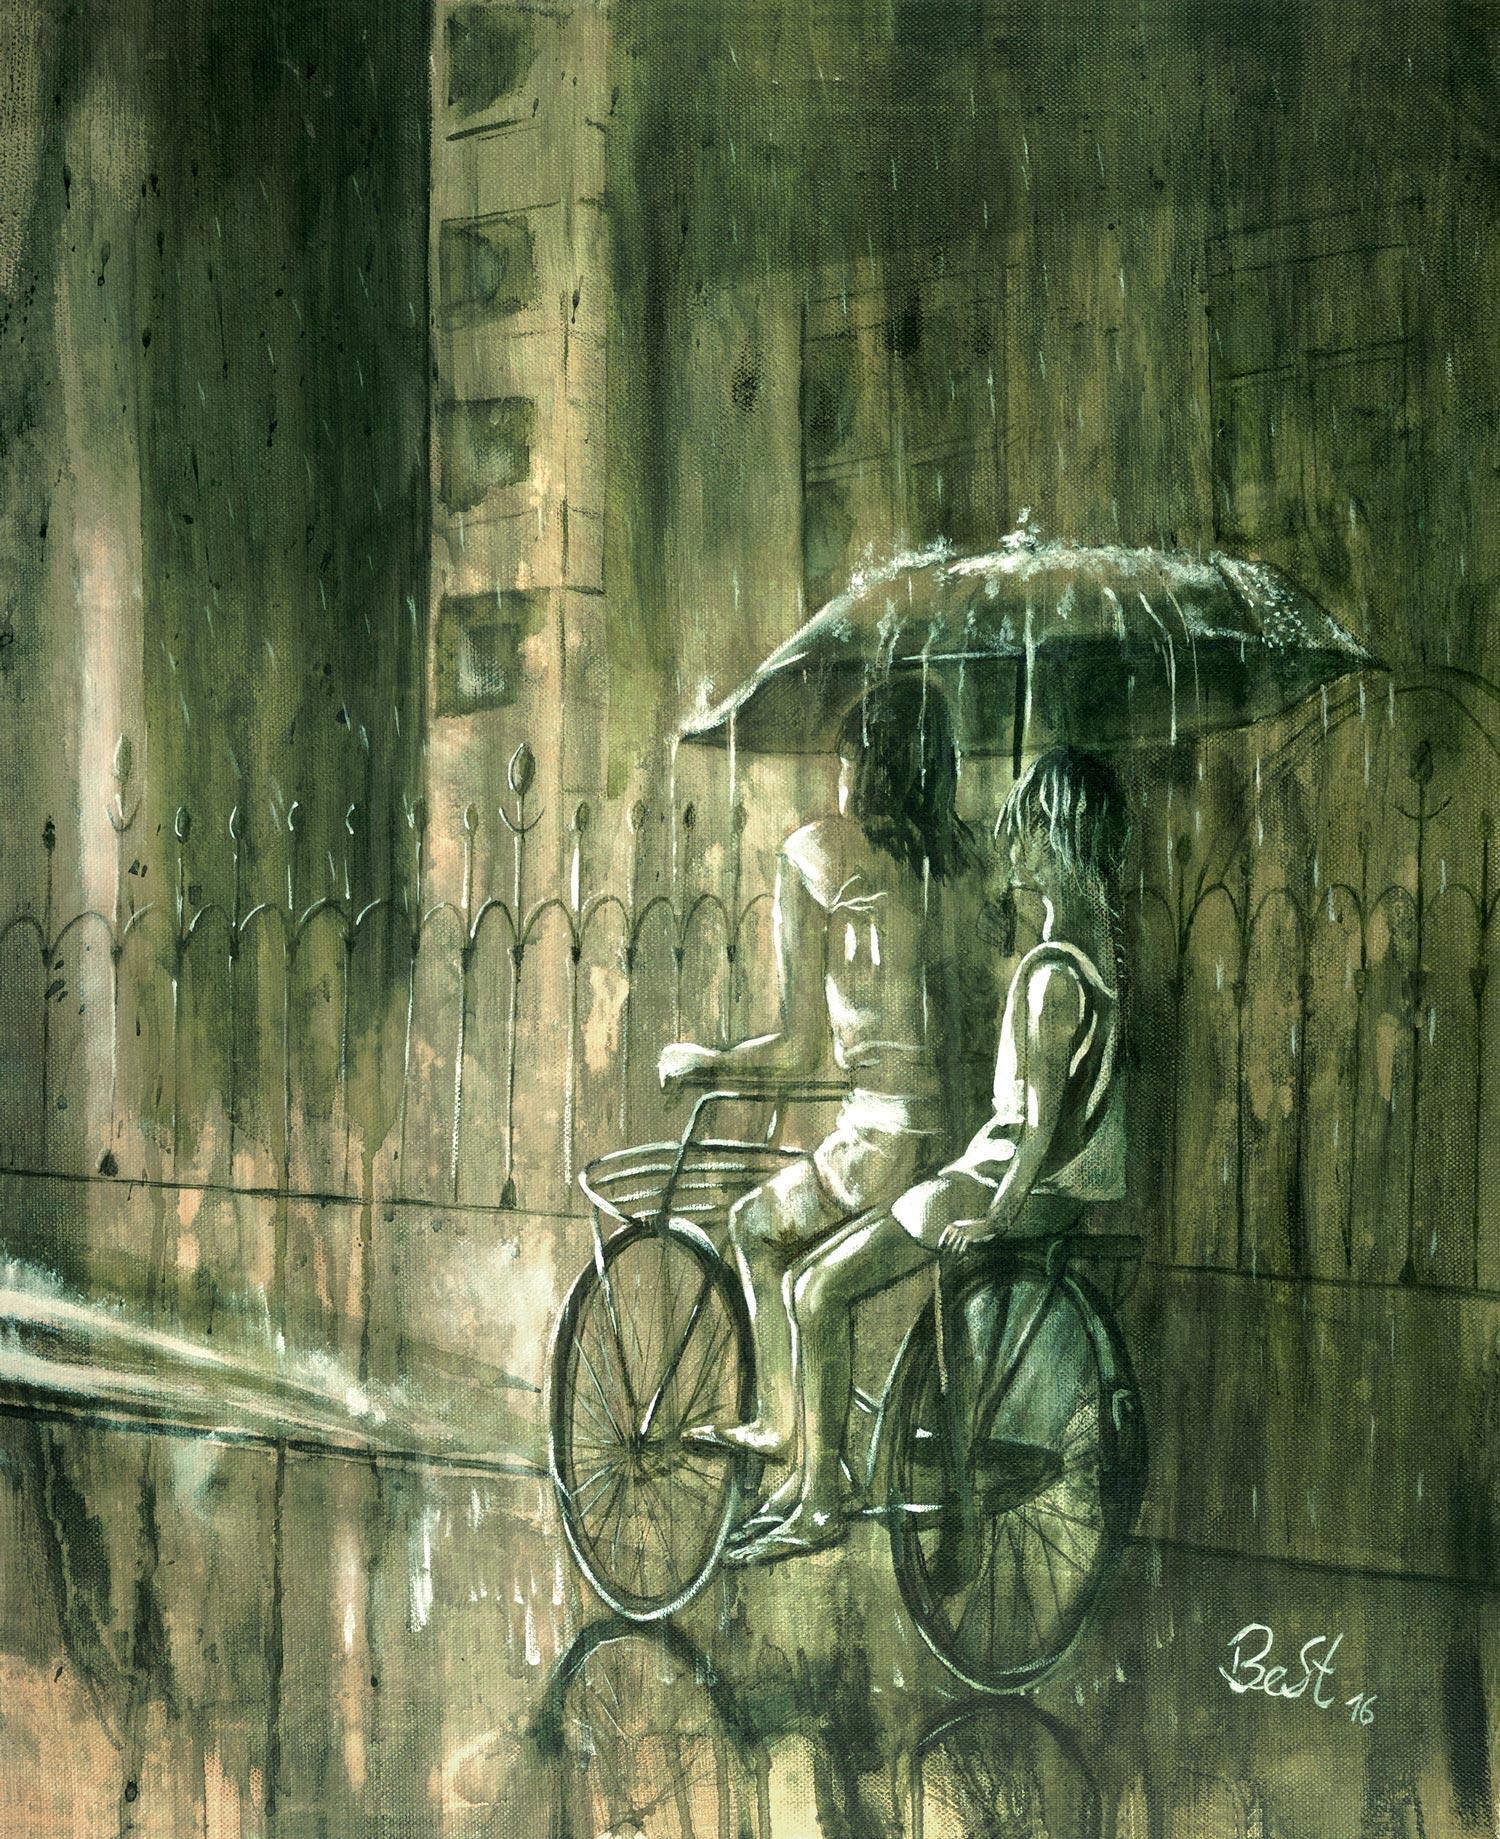 Summer Rain by Bettina Stegemann